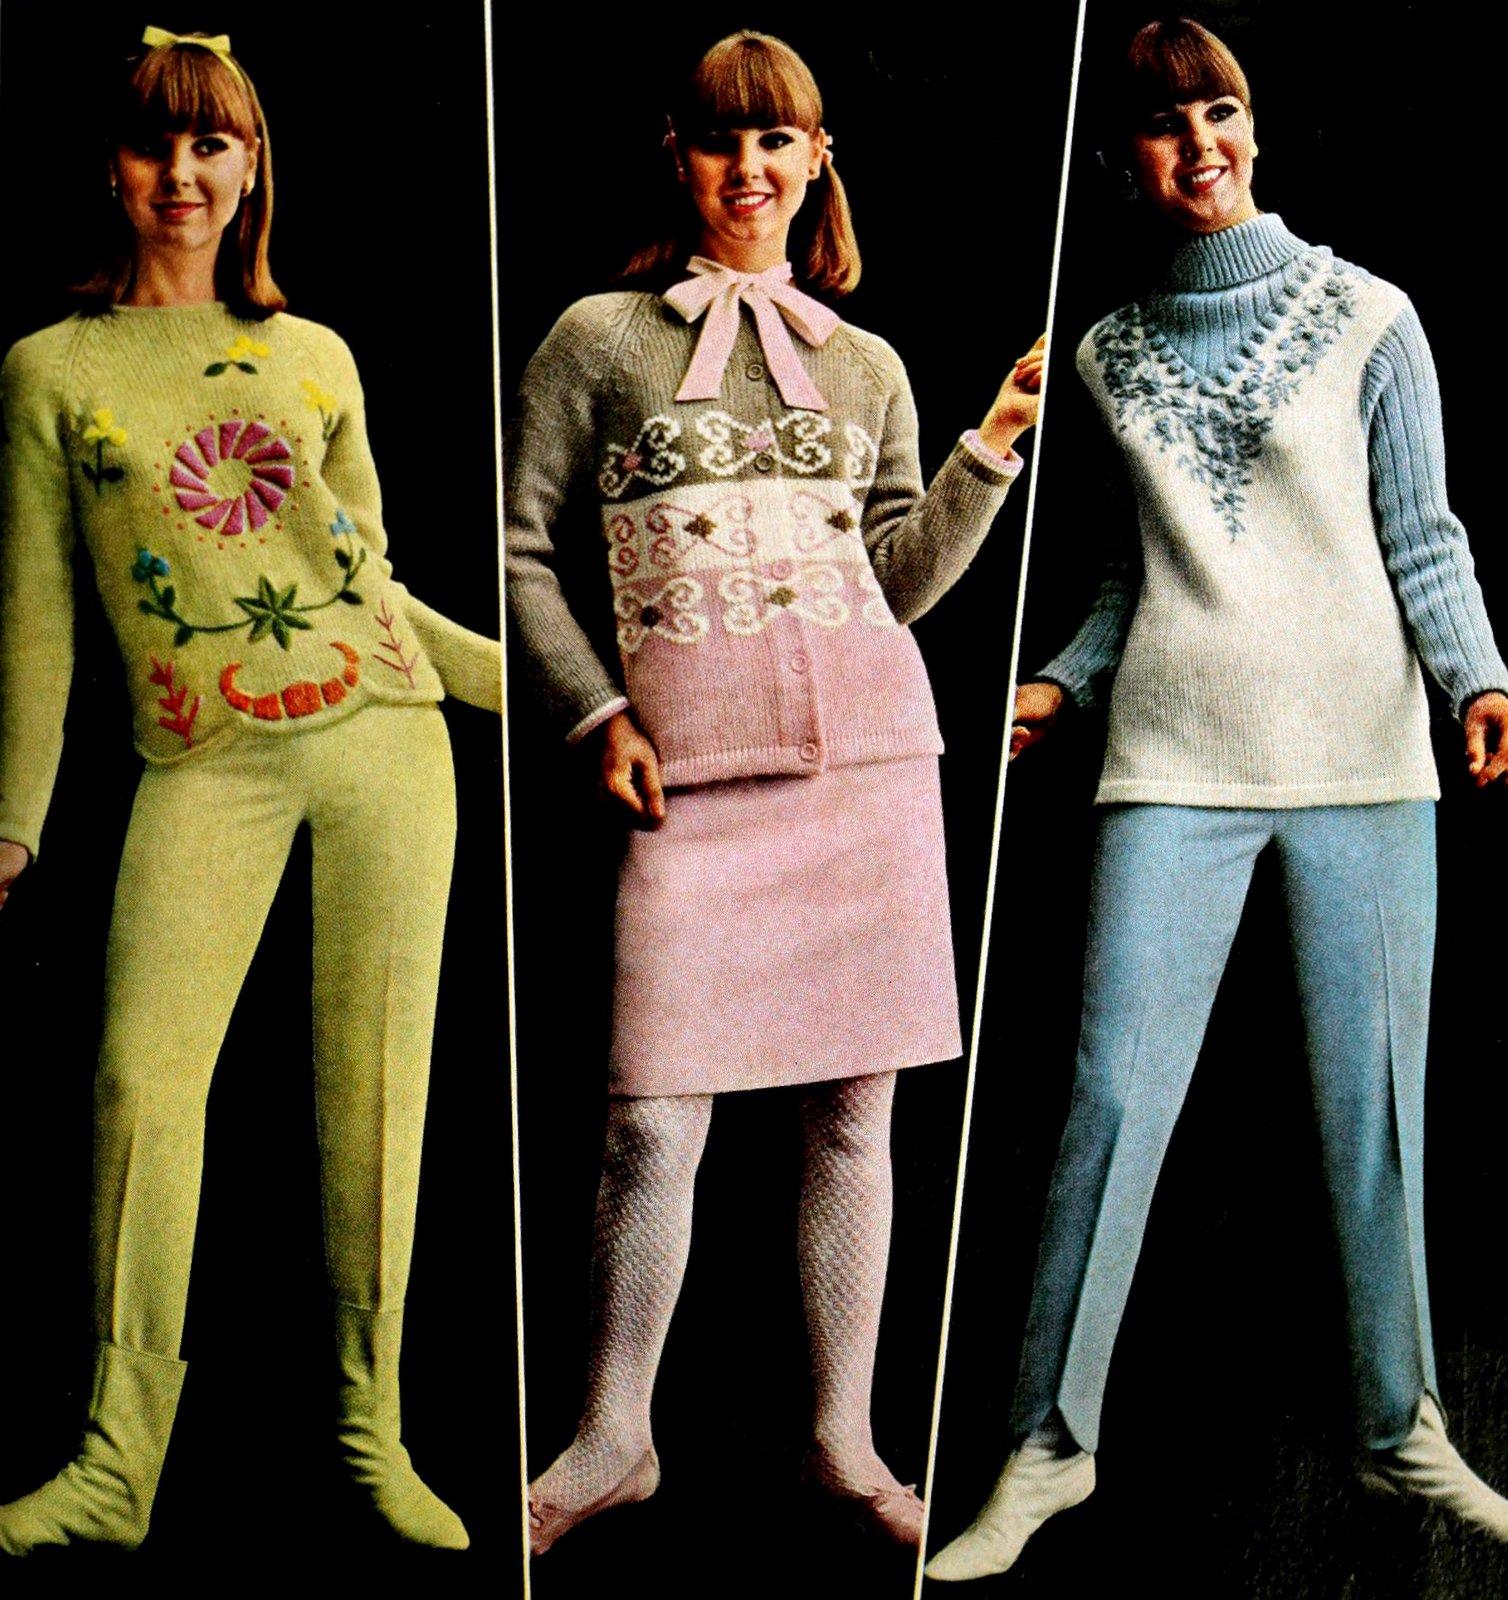 Sixties womenswear - three sweater set styles (1965)